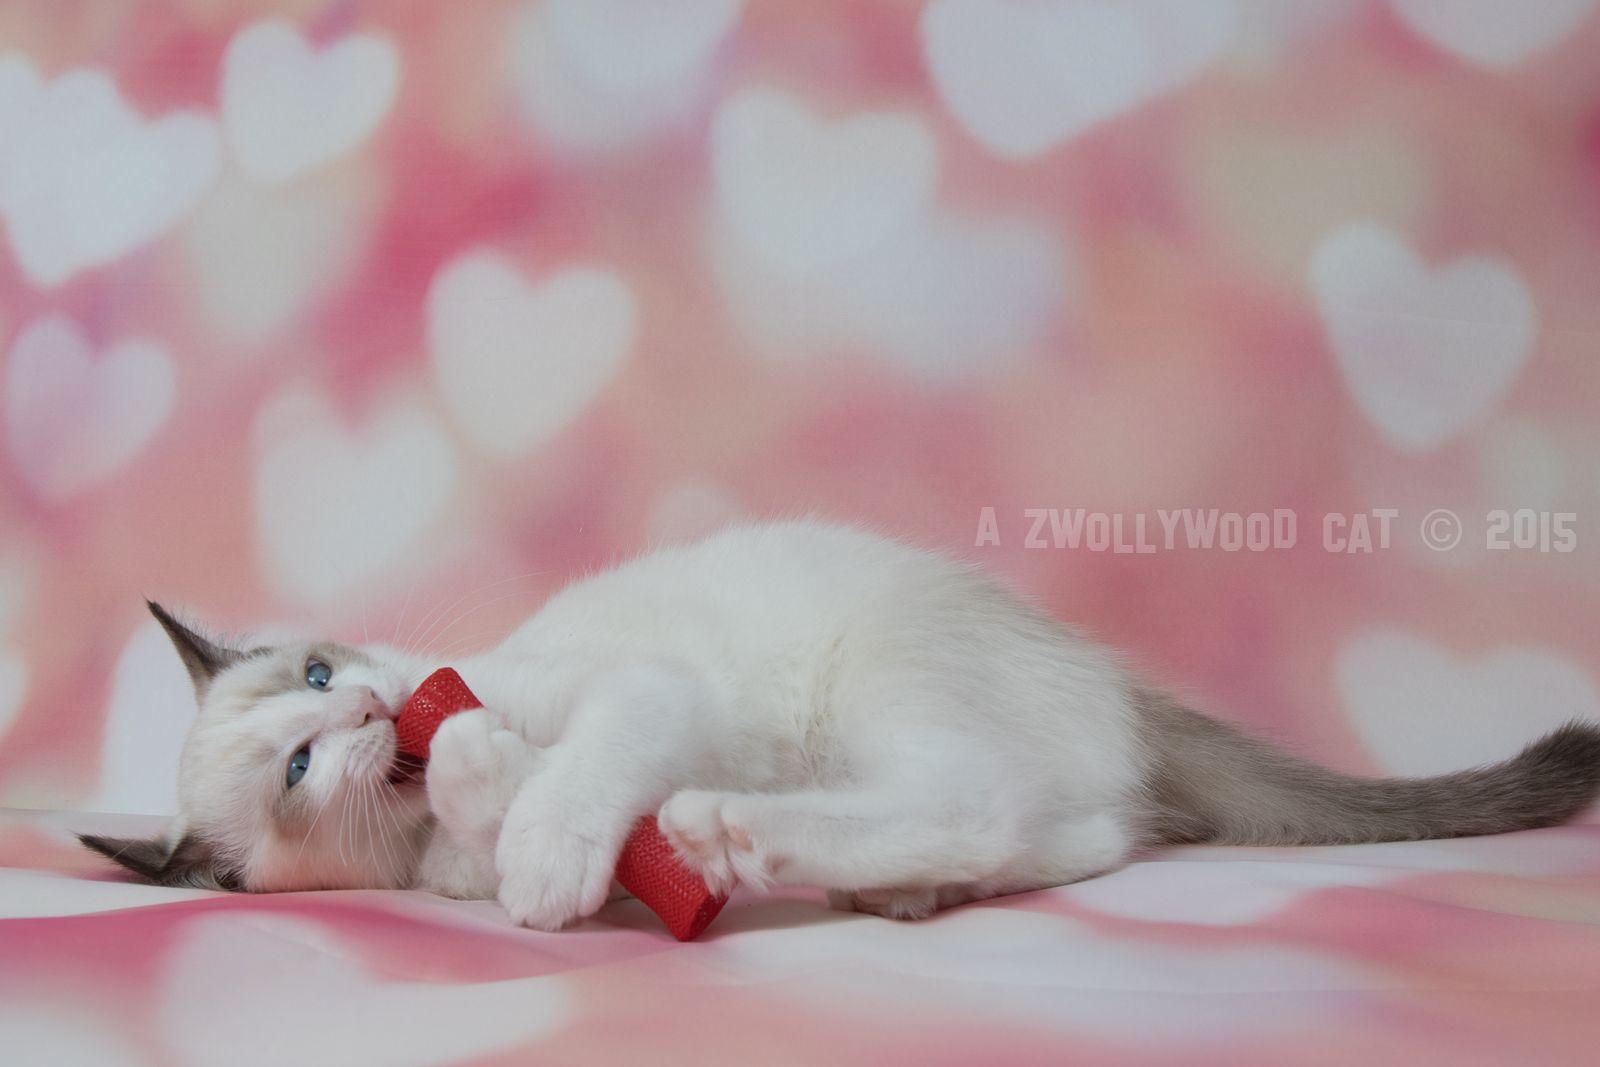 2015 Heimdall A Zwollywood Cat 12 Weeks Old Ragdoll Kitten Chocolate Bicolour Dark World Litter